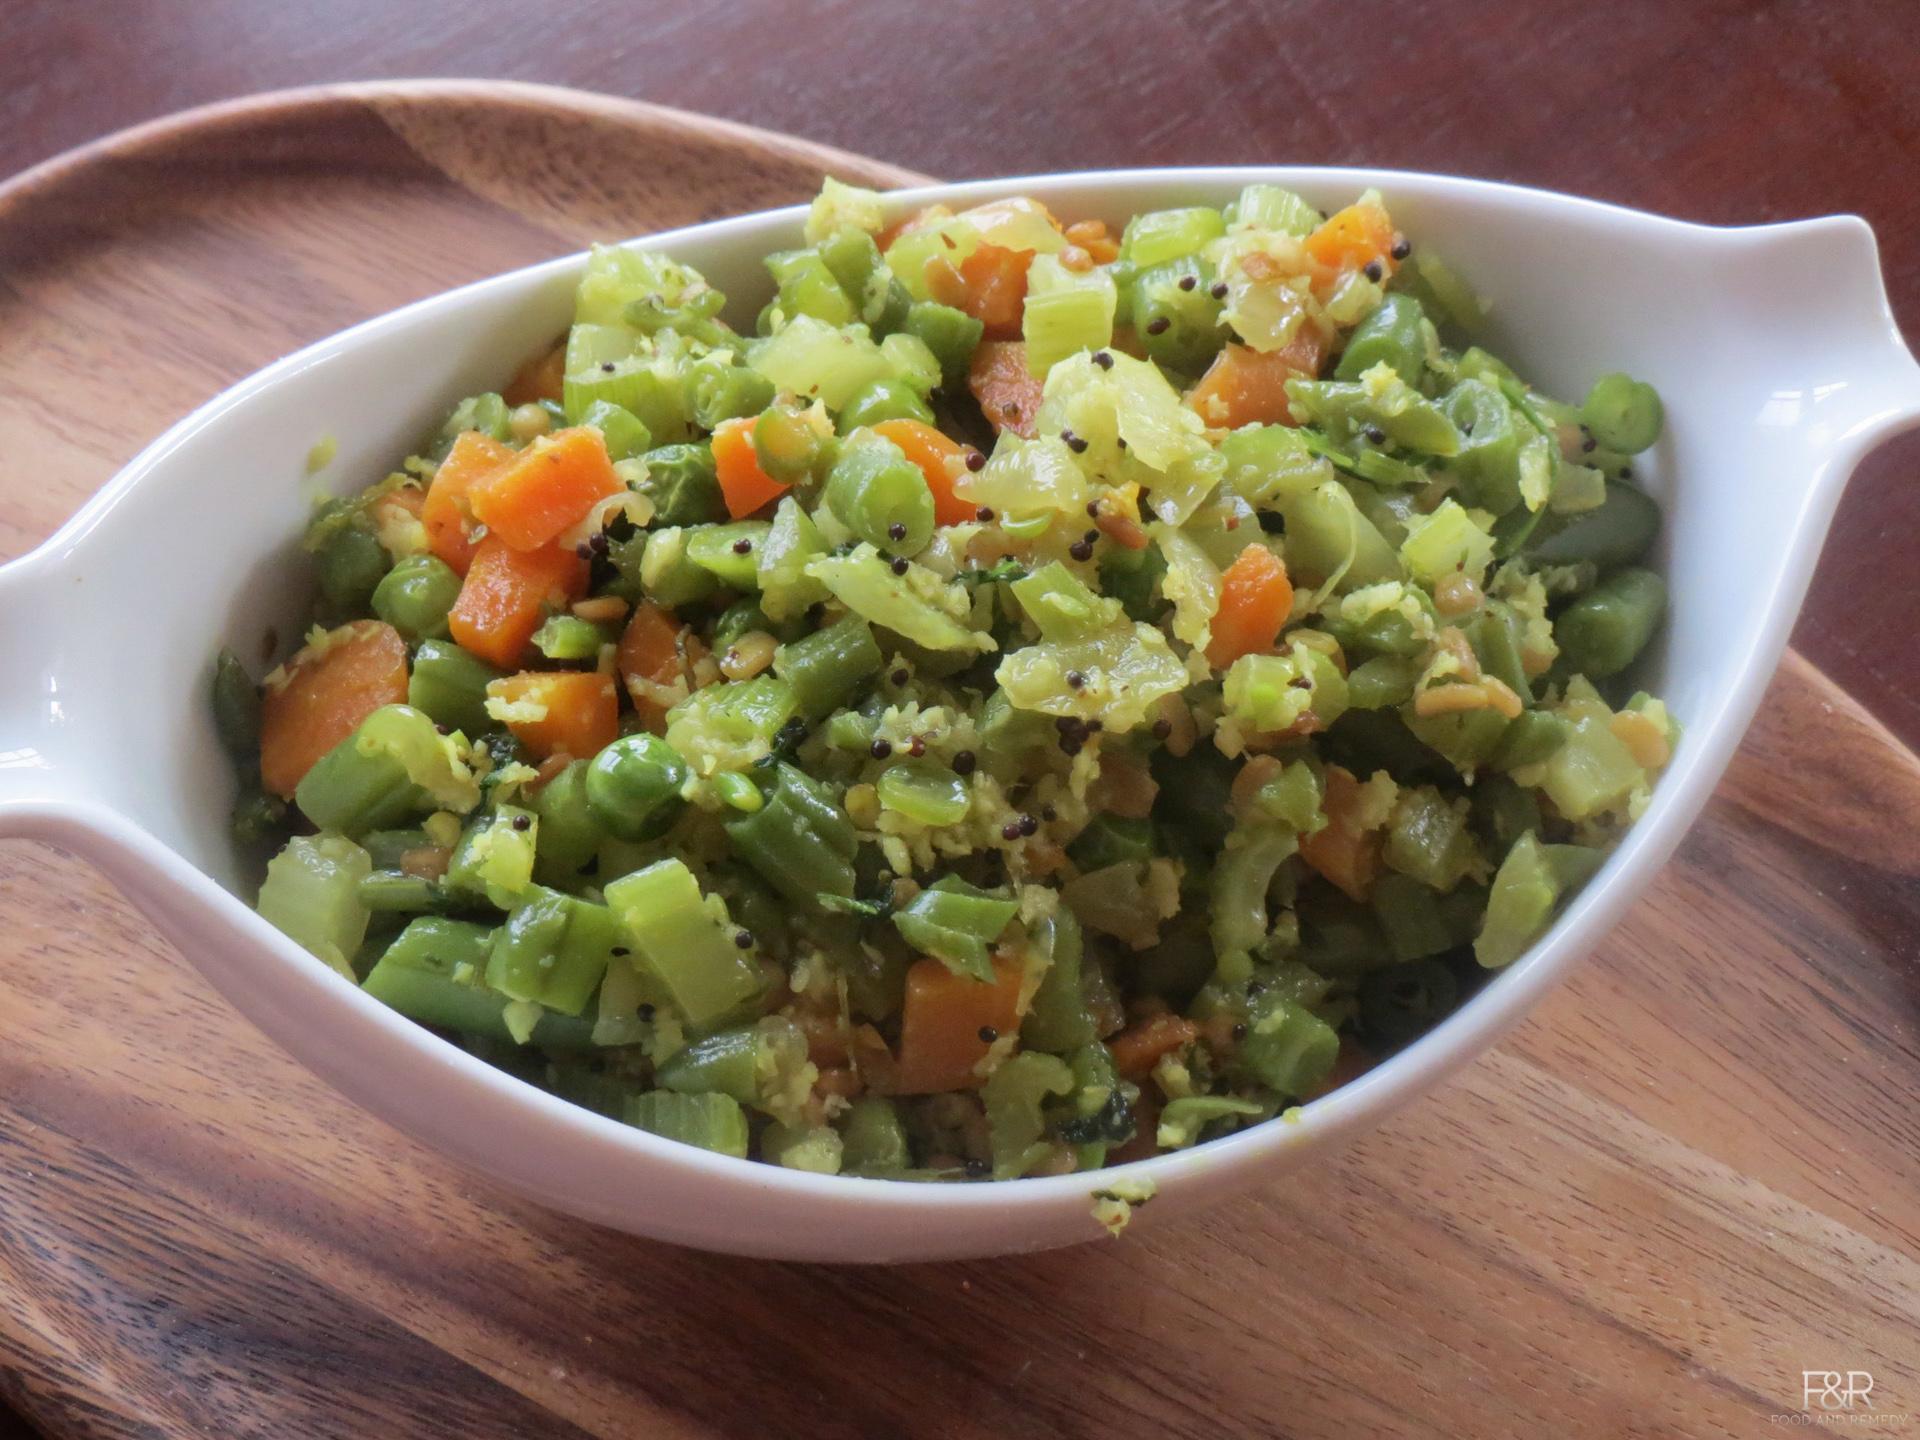 Celery Carrot Beans Stir Fry Recipe, How To Make Mixed